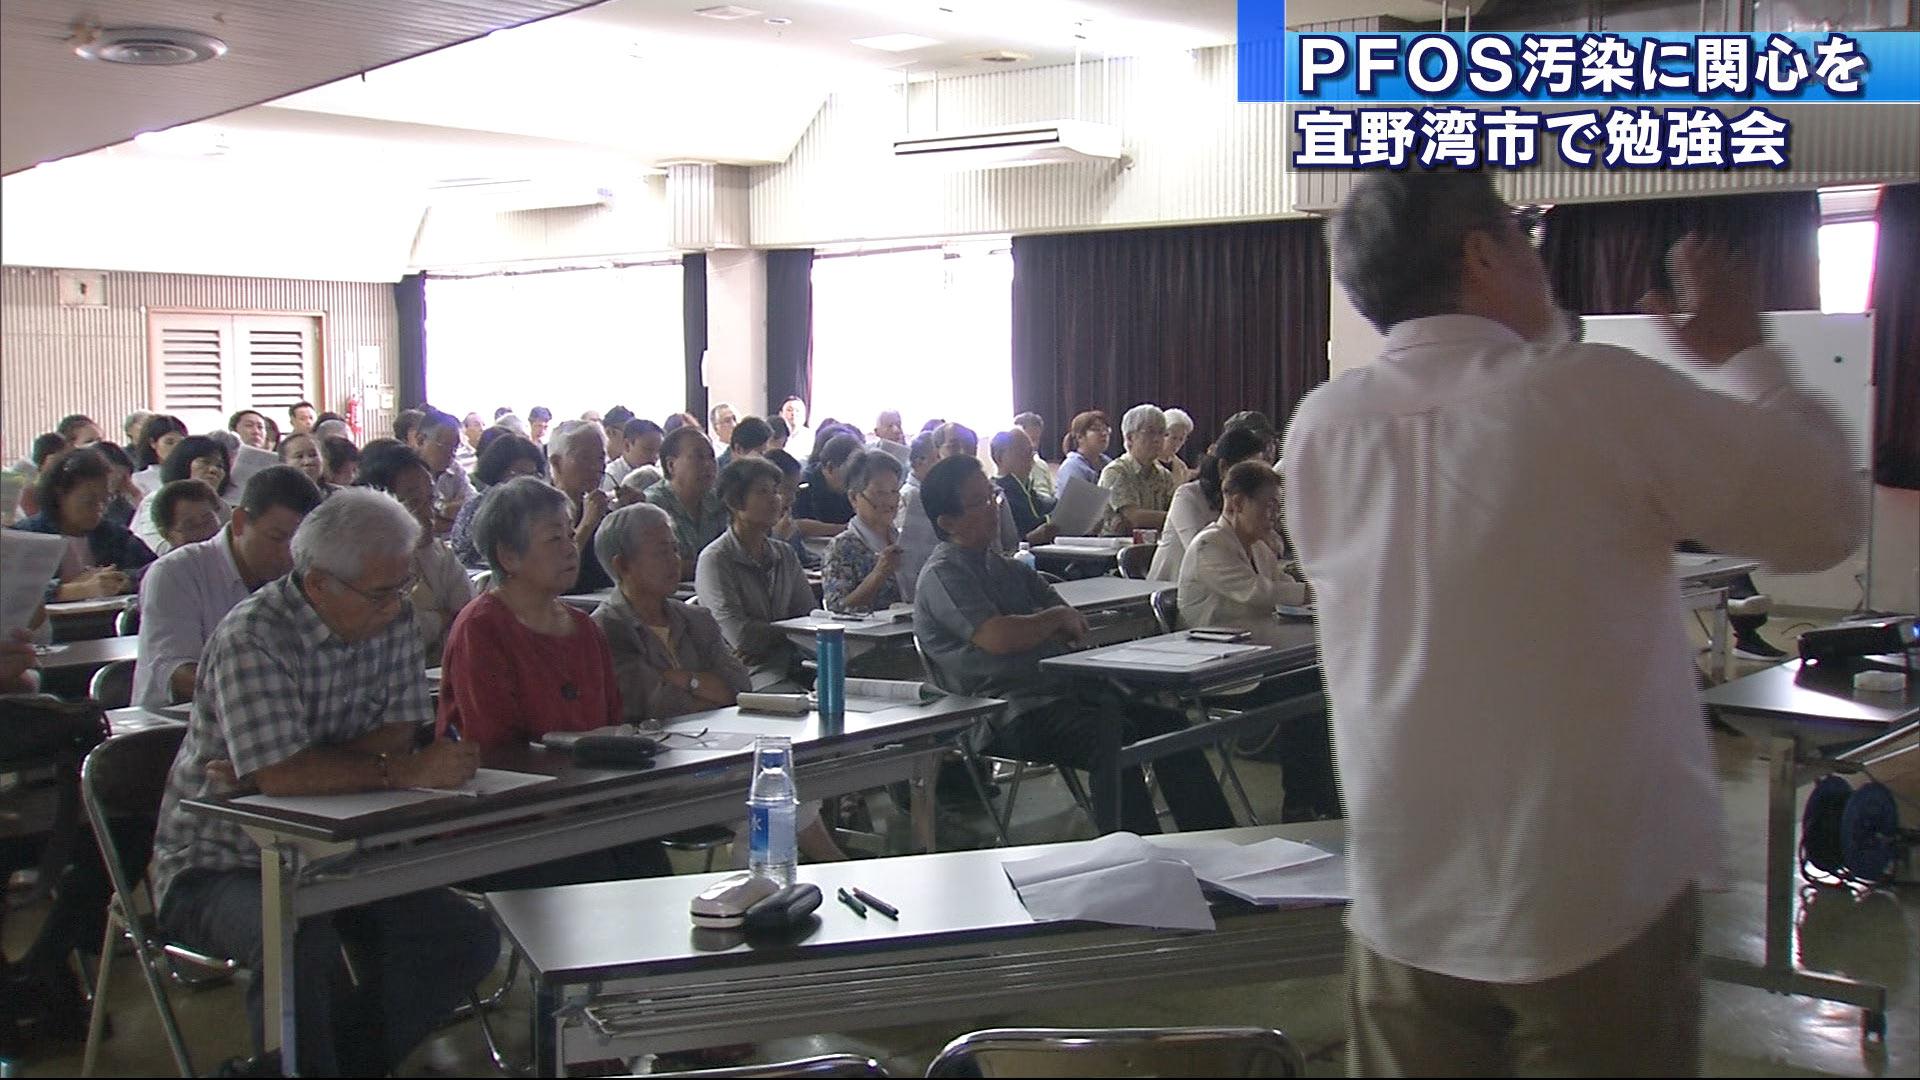 PFOS汚染で勉強会